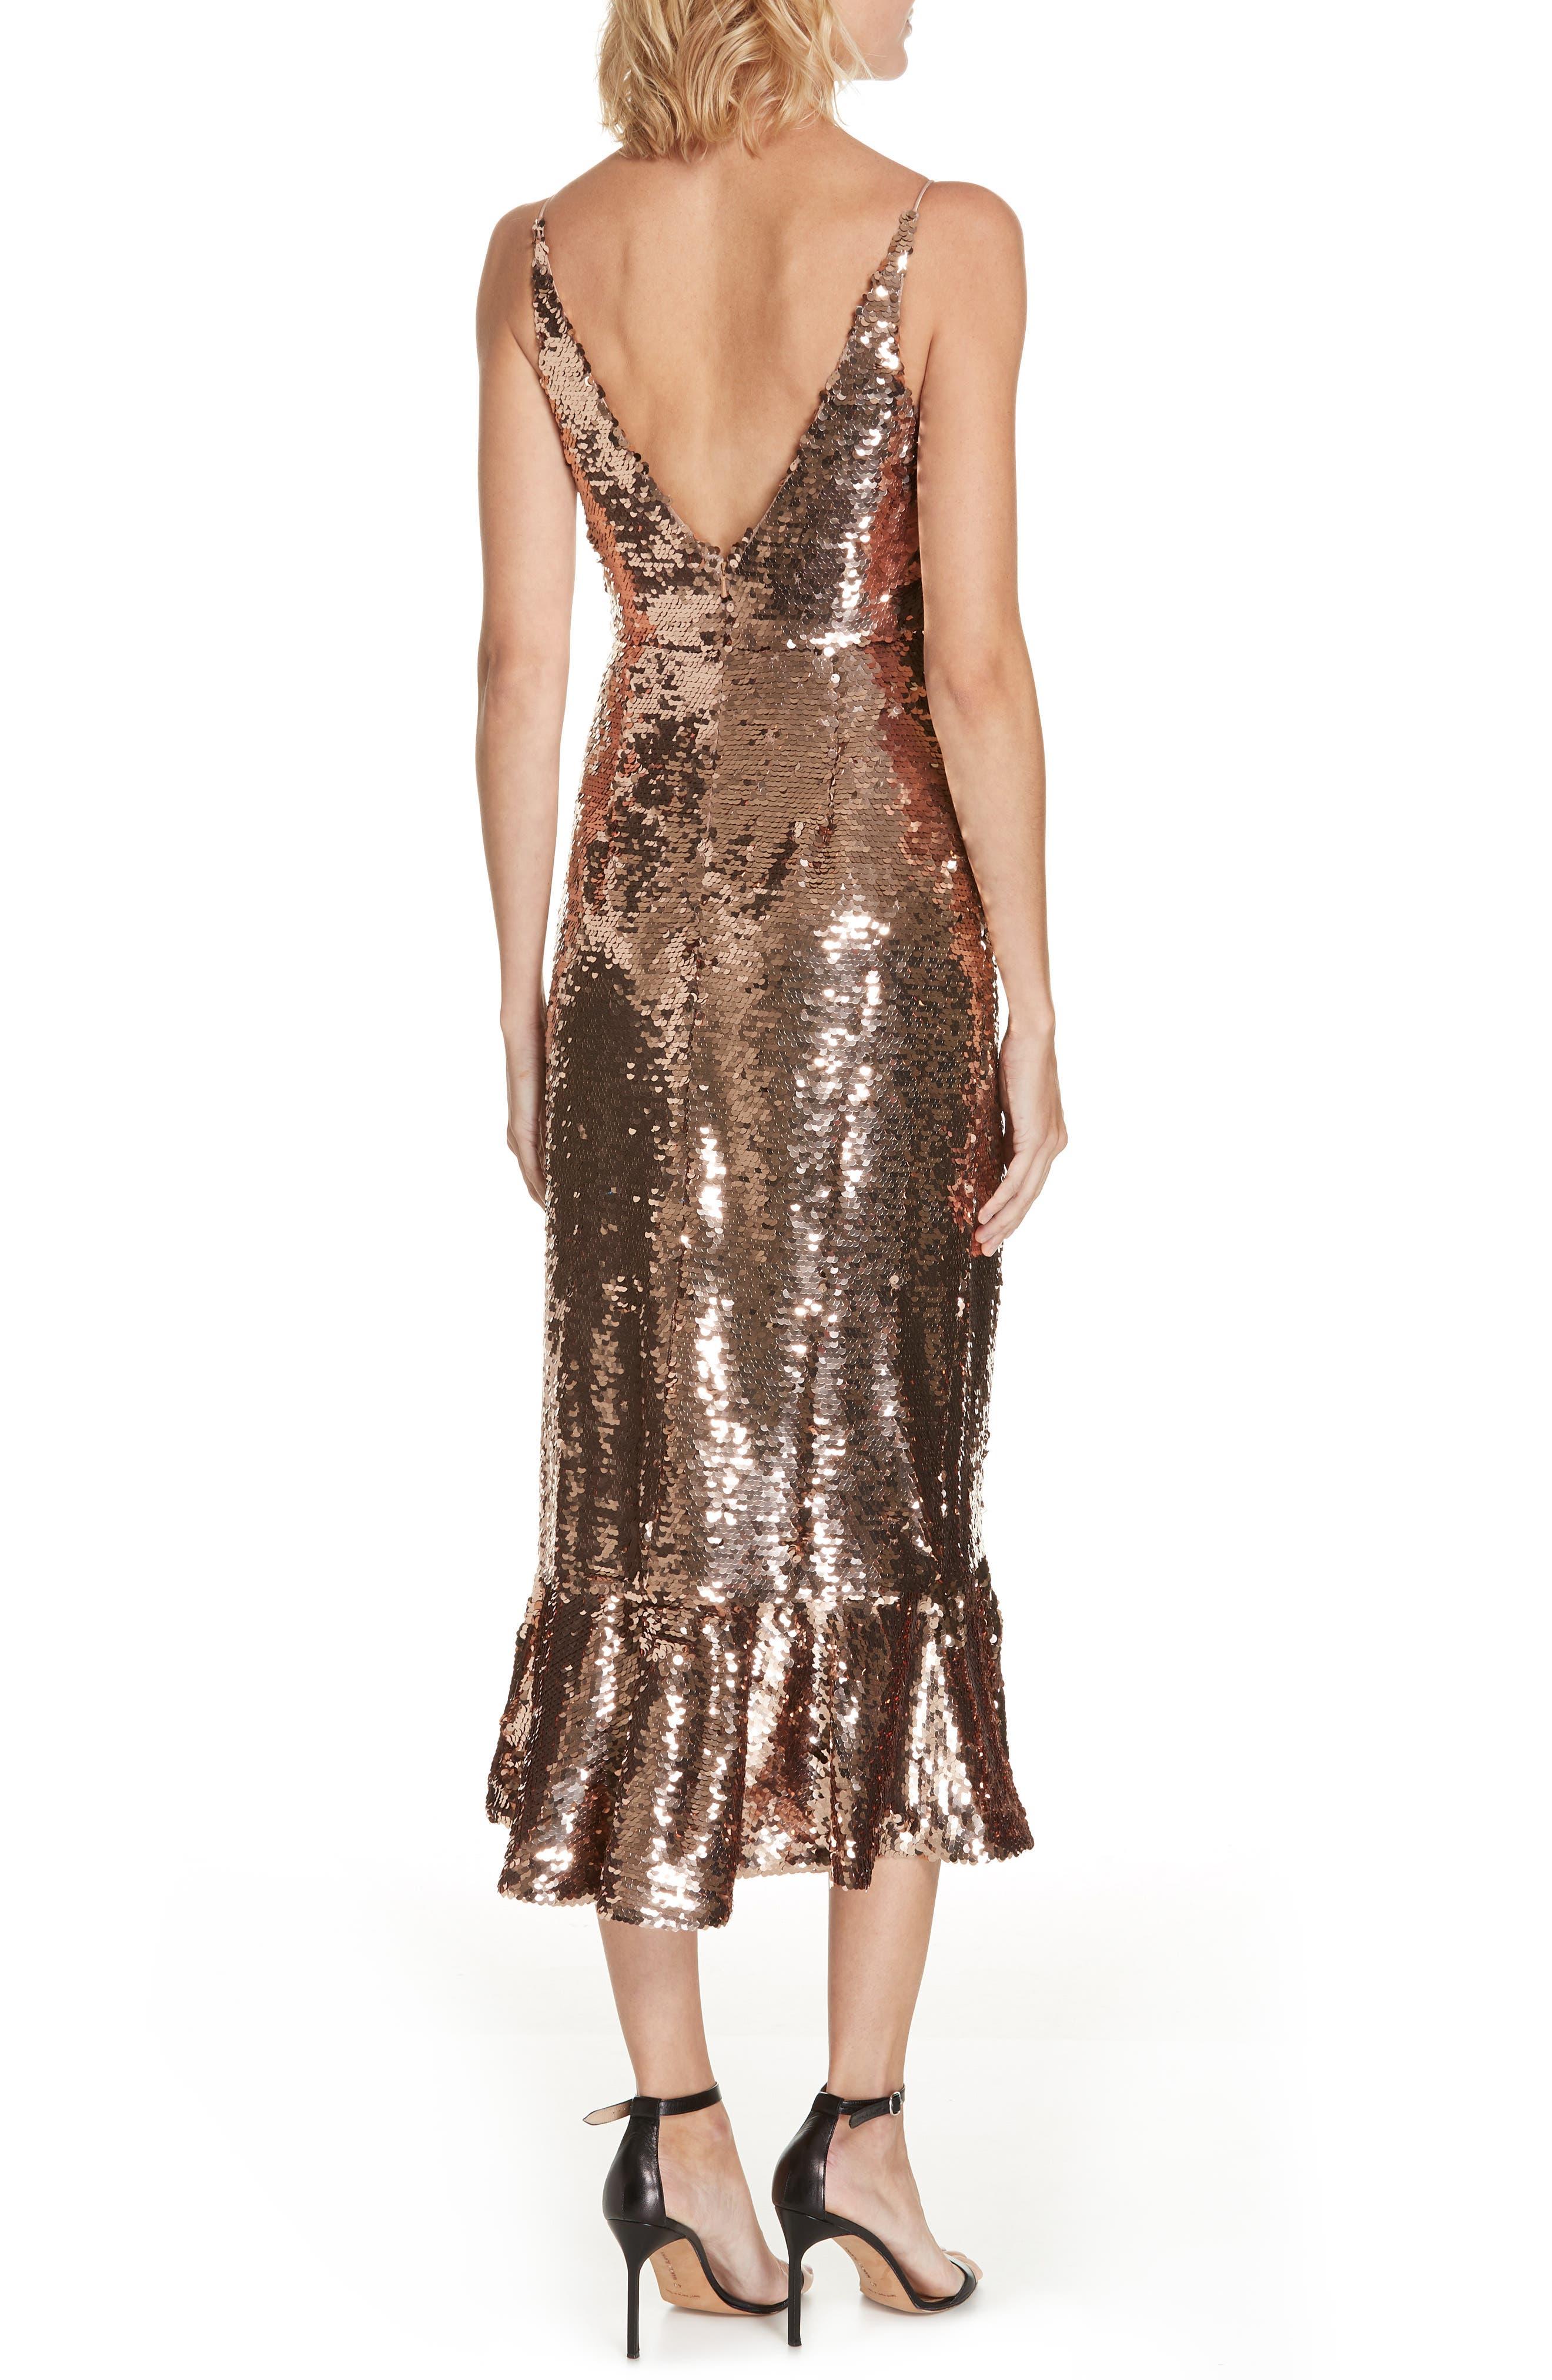 SALONI, Aidan Sequin Ruffle Hem Midi Dress, Alternate thumbnail 2, color, BRONZE